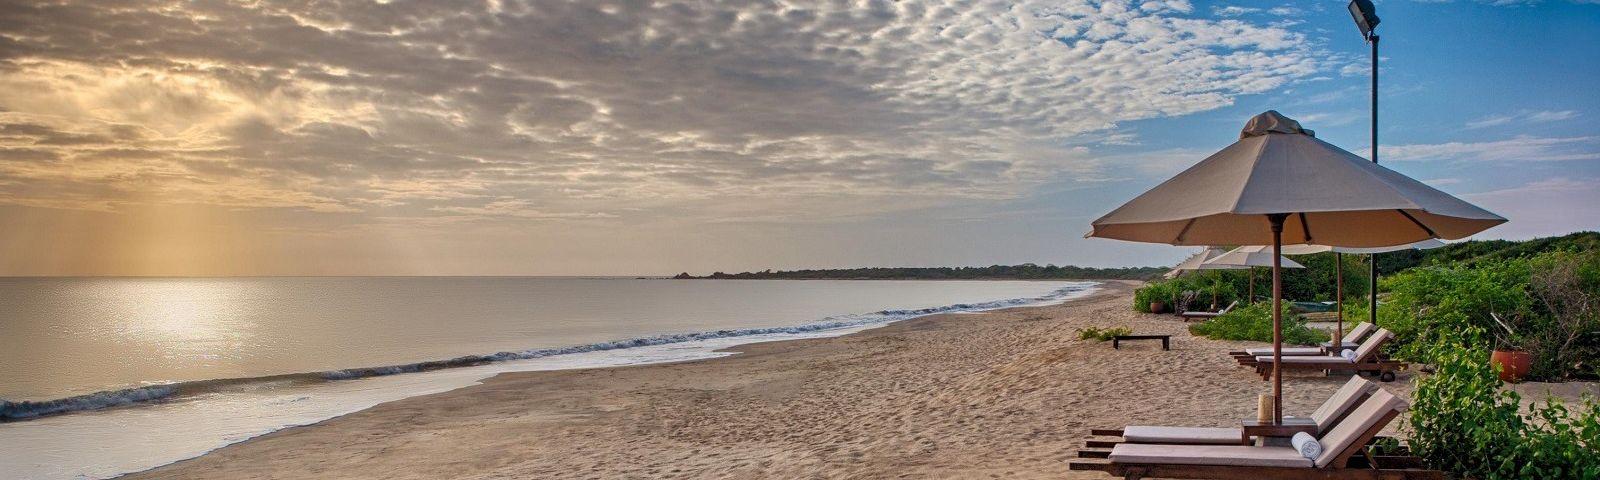 Sri Lanka Dschungel Resort am Strand